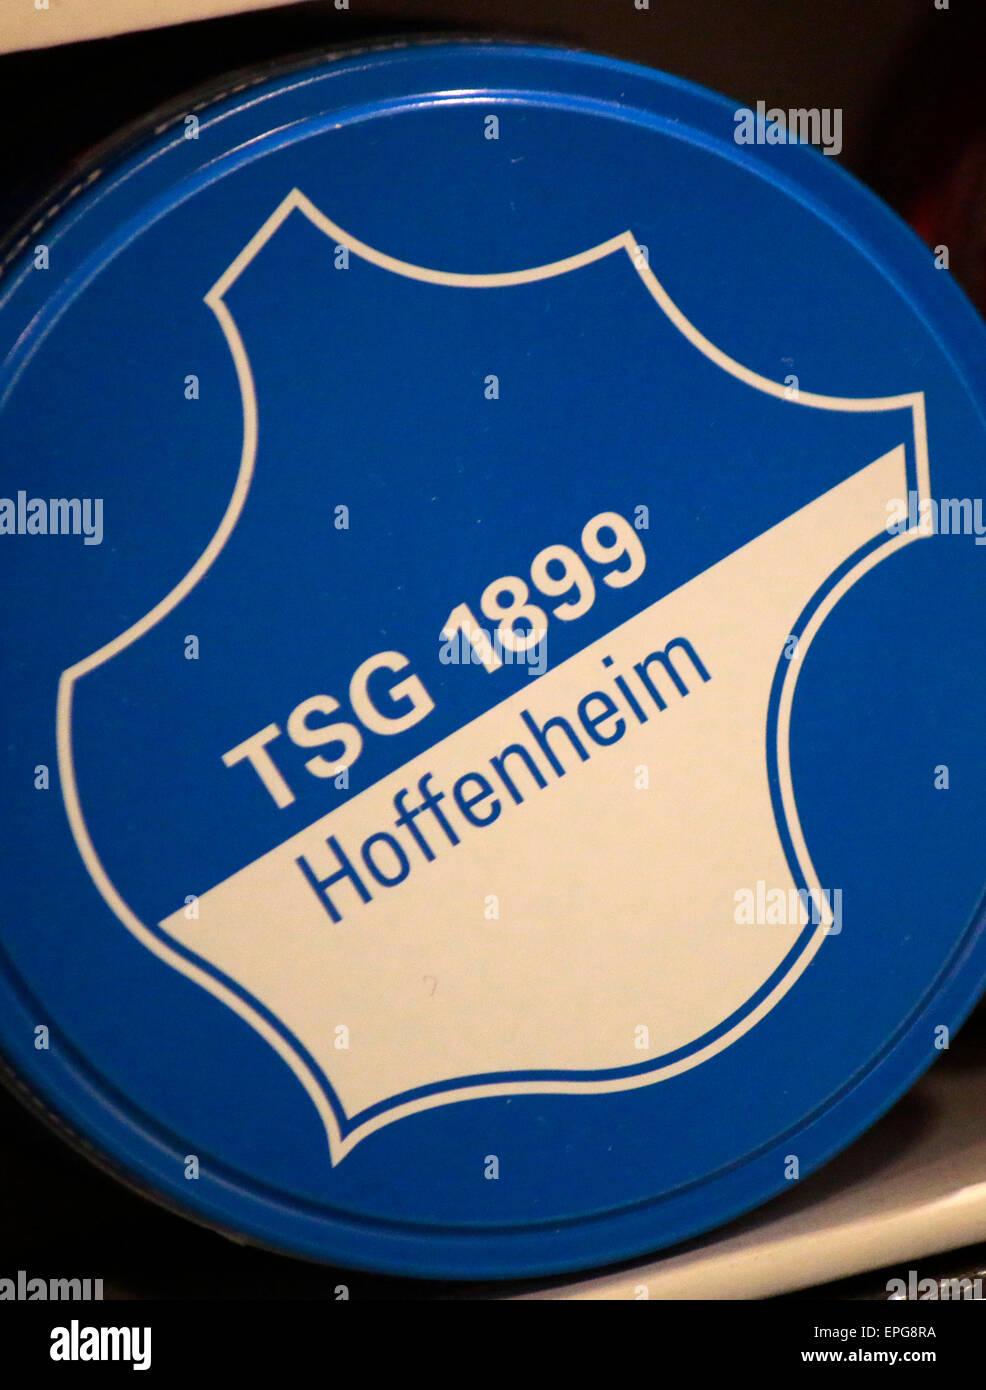 Markennamen: 'TSG 1899 Hoffenheim', Berlin. - Stock Image